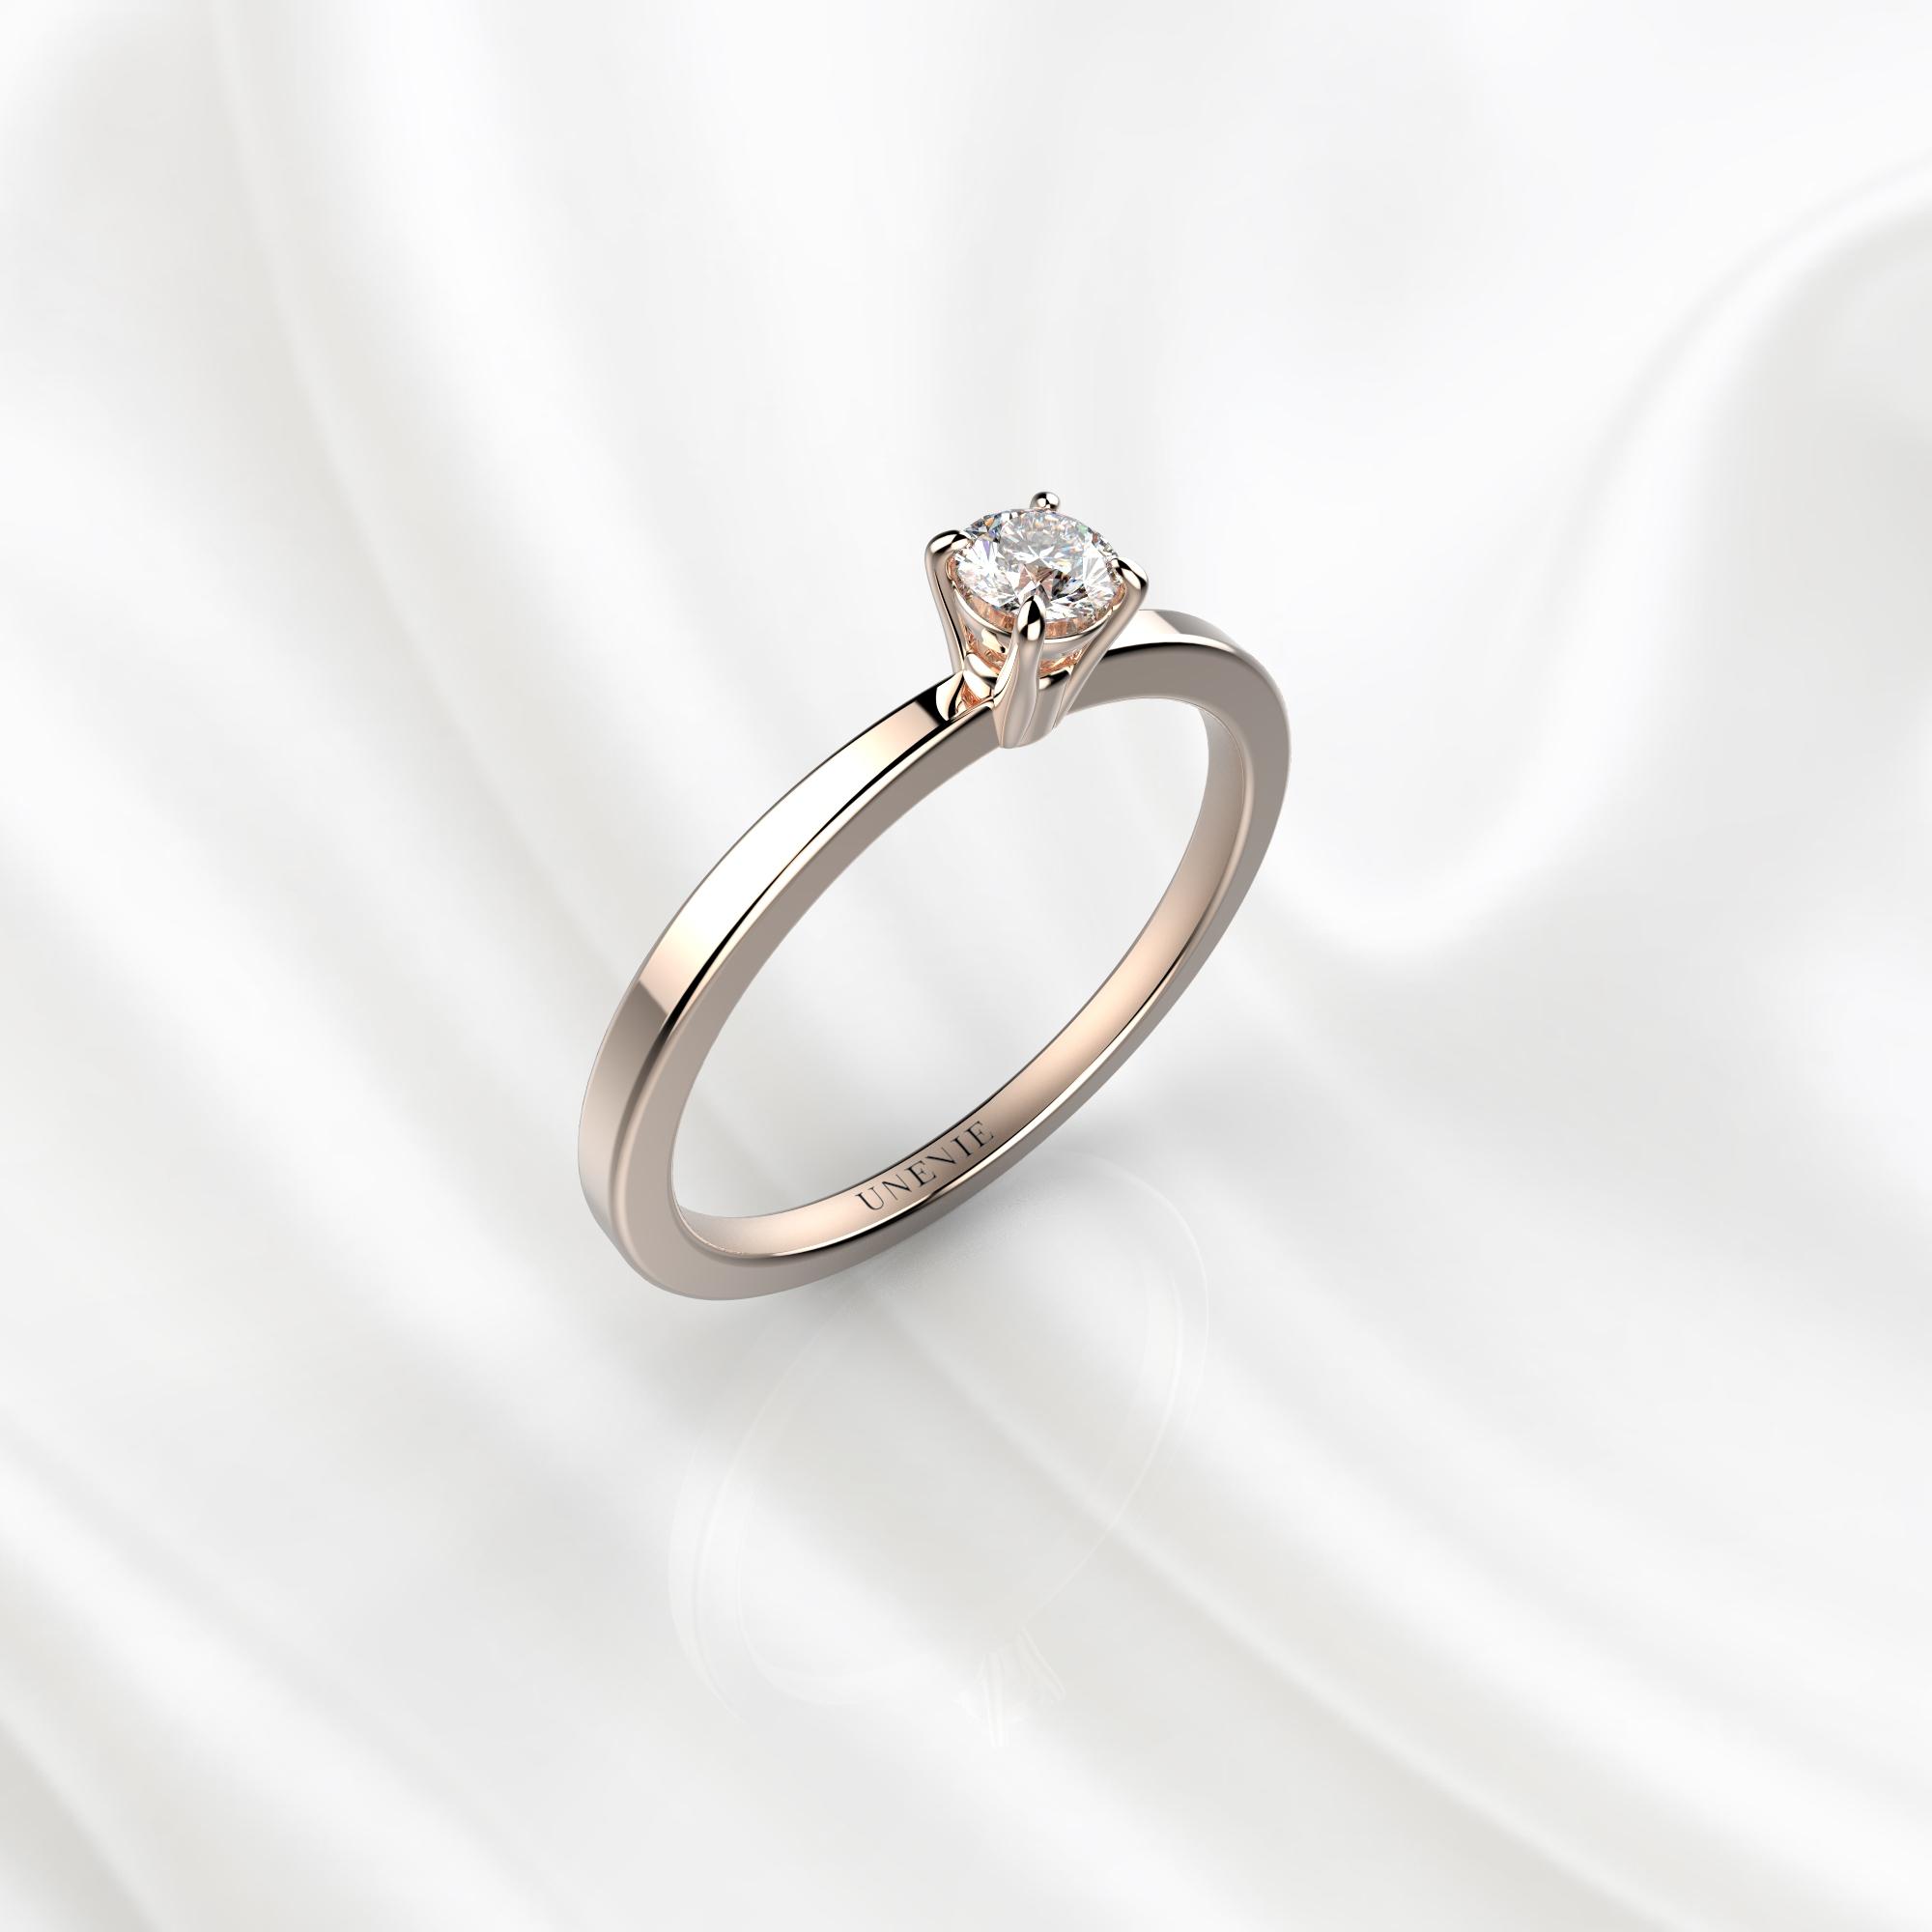 N22 Помолвочное кольцо из розового золота с бриллиантом 0.1 карат